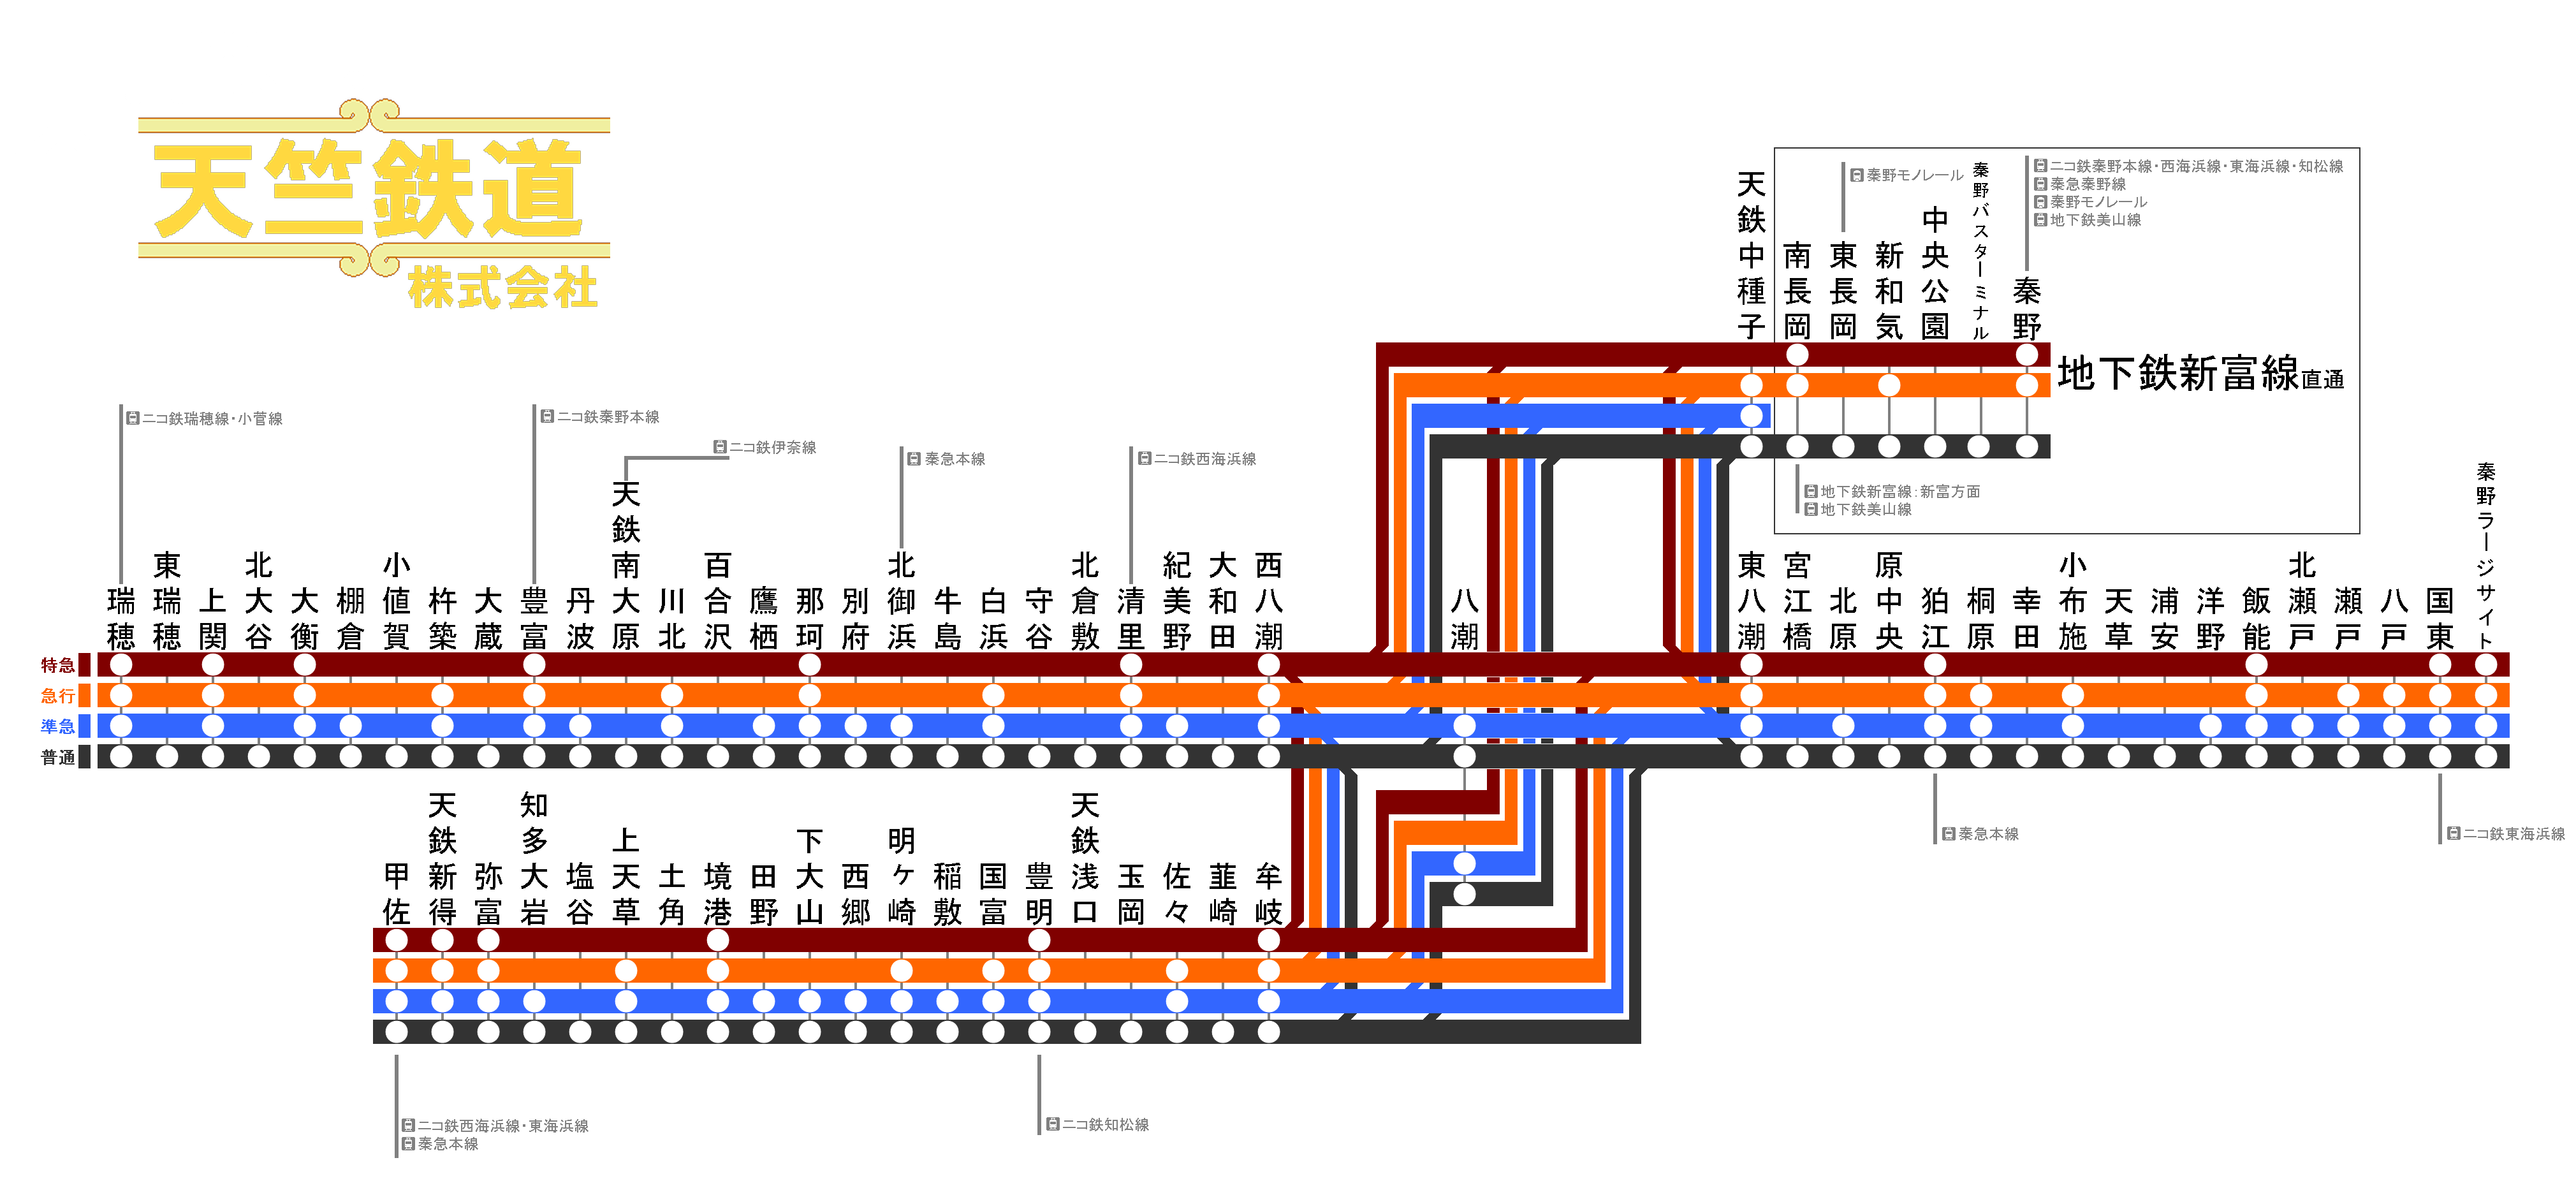 天鉄1997年版路線図